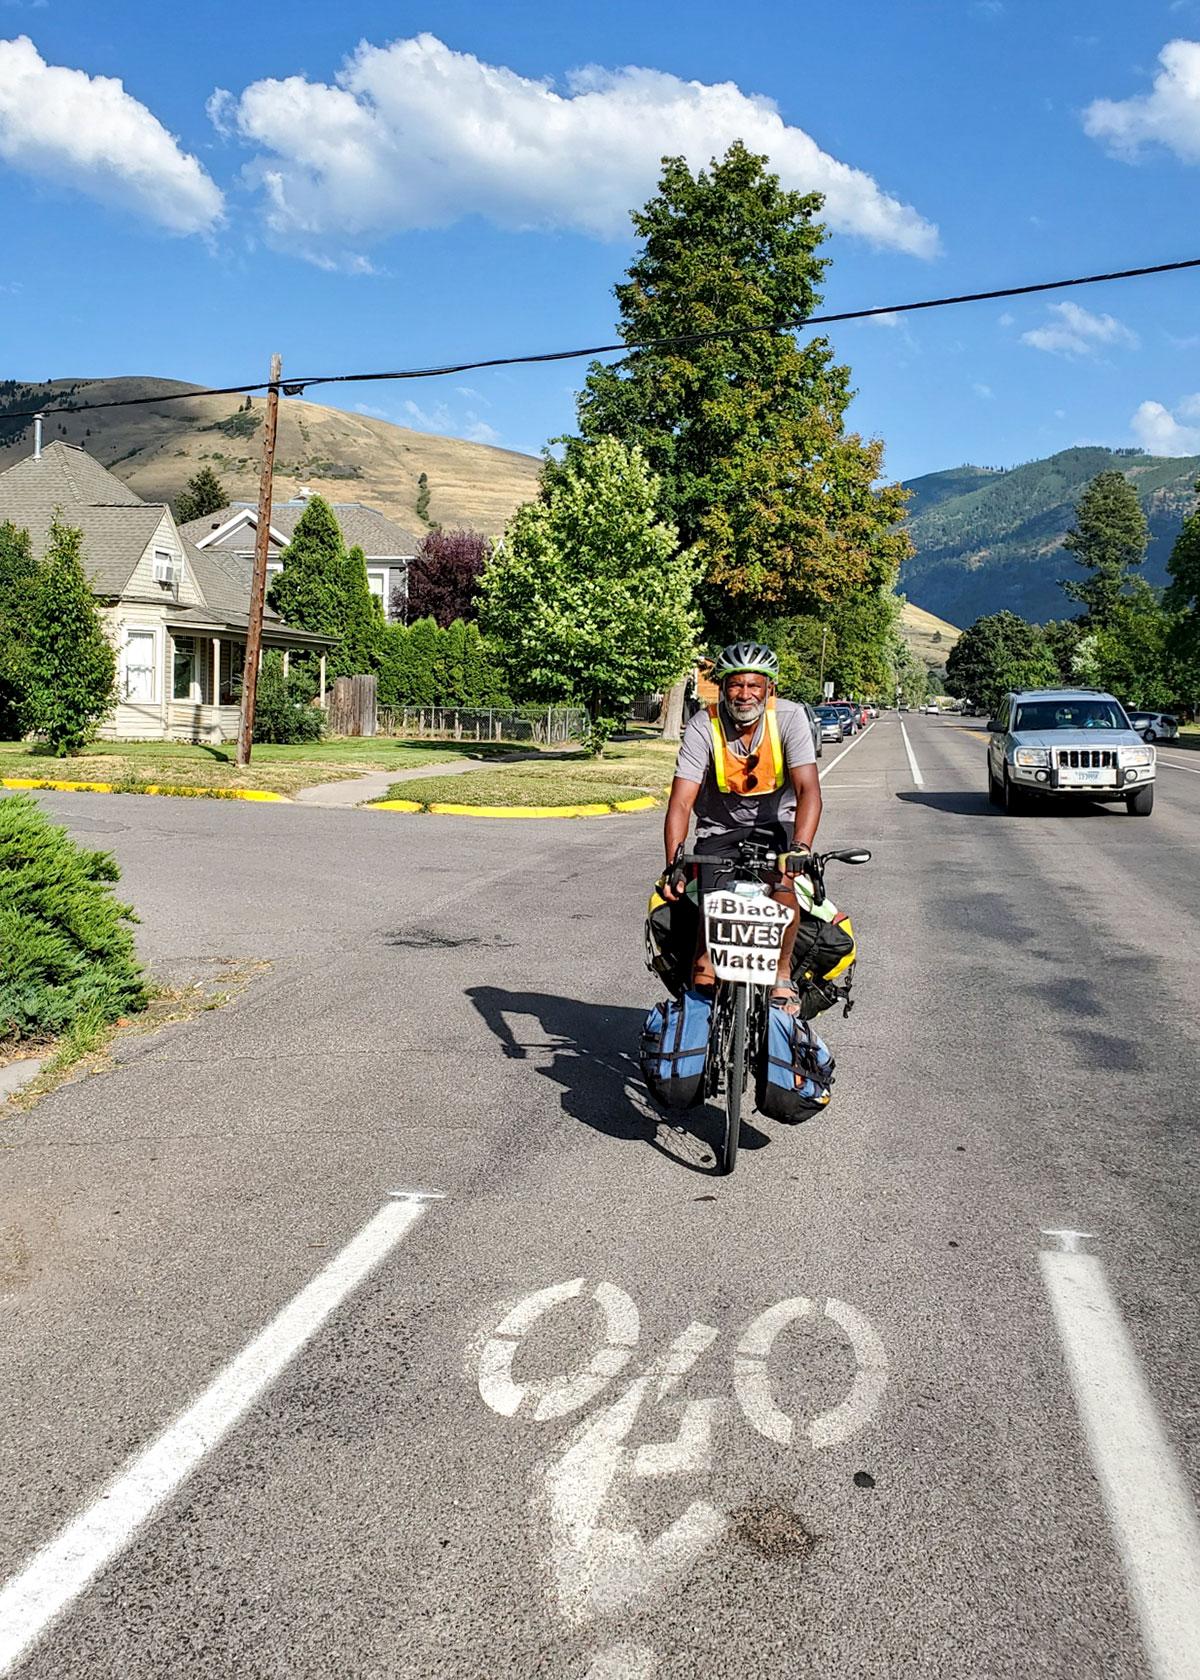 Edwards biking through Missoula. Dr. Ellie Steinberg